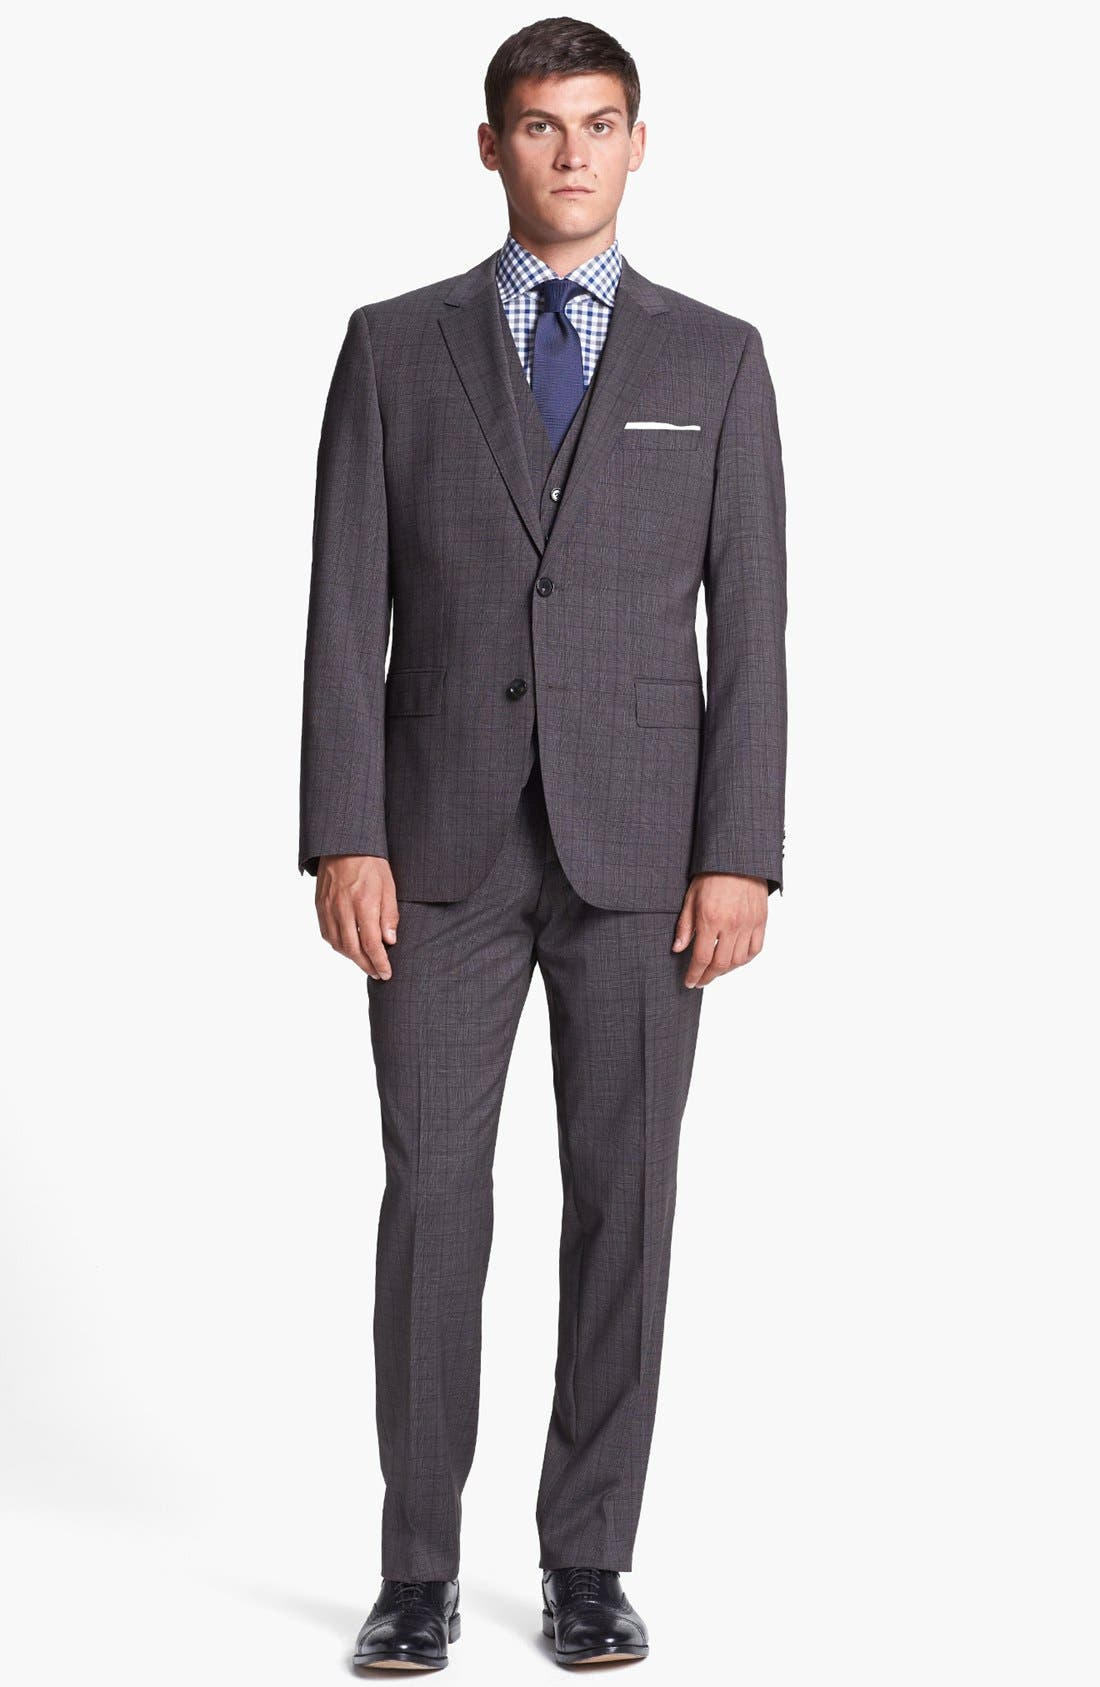 Main Image - BOSS HUGO BOSS 'James/Sharp' Trim Fit Three Piece Plaid Suit